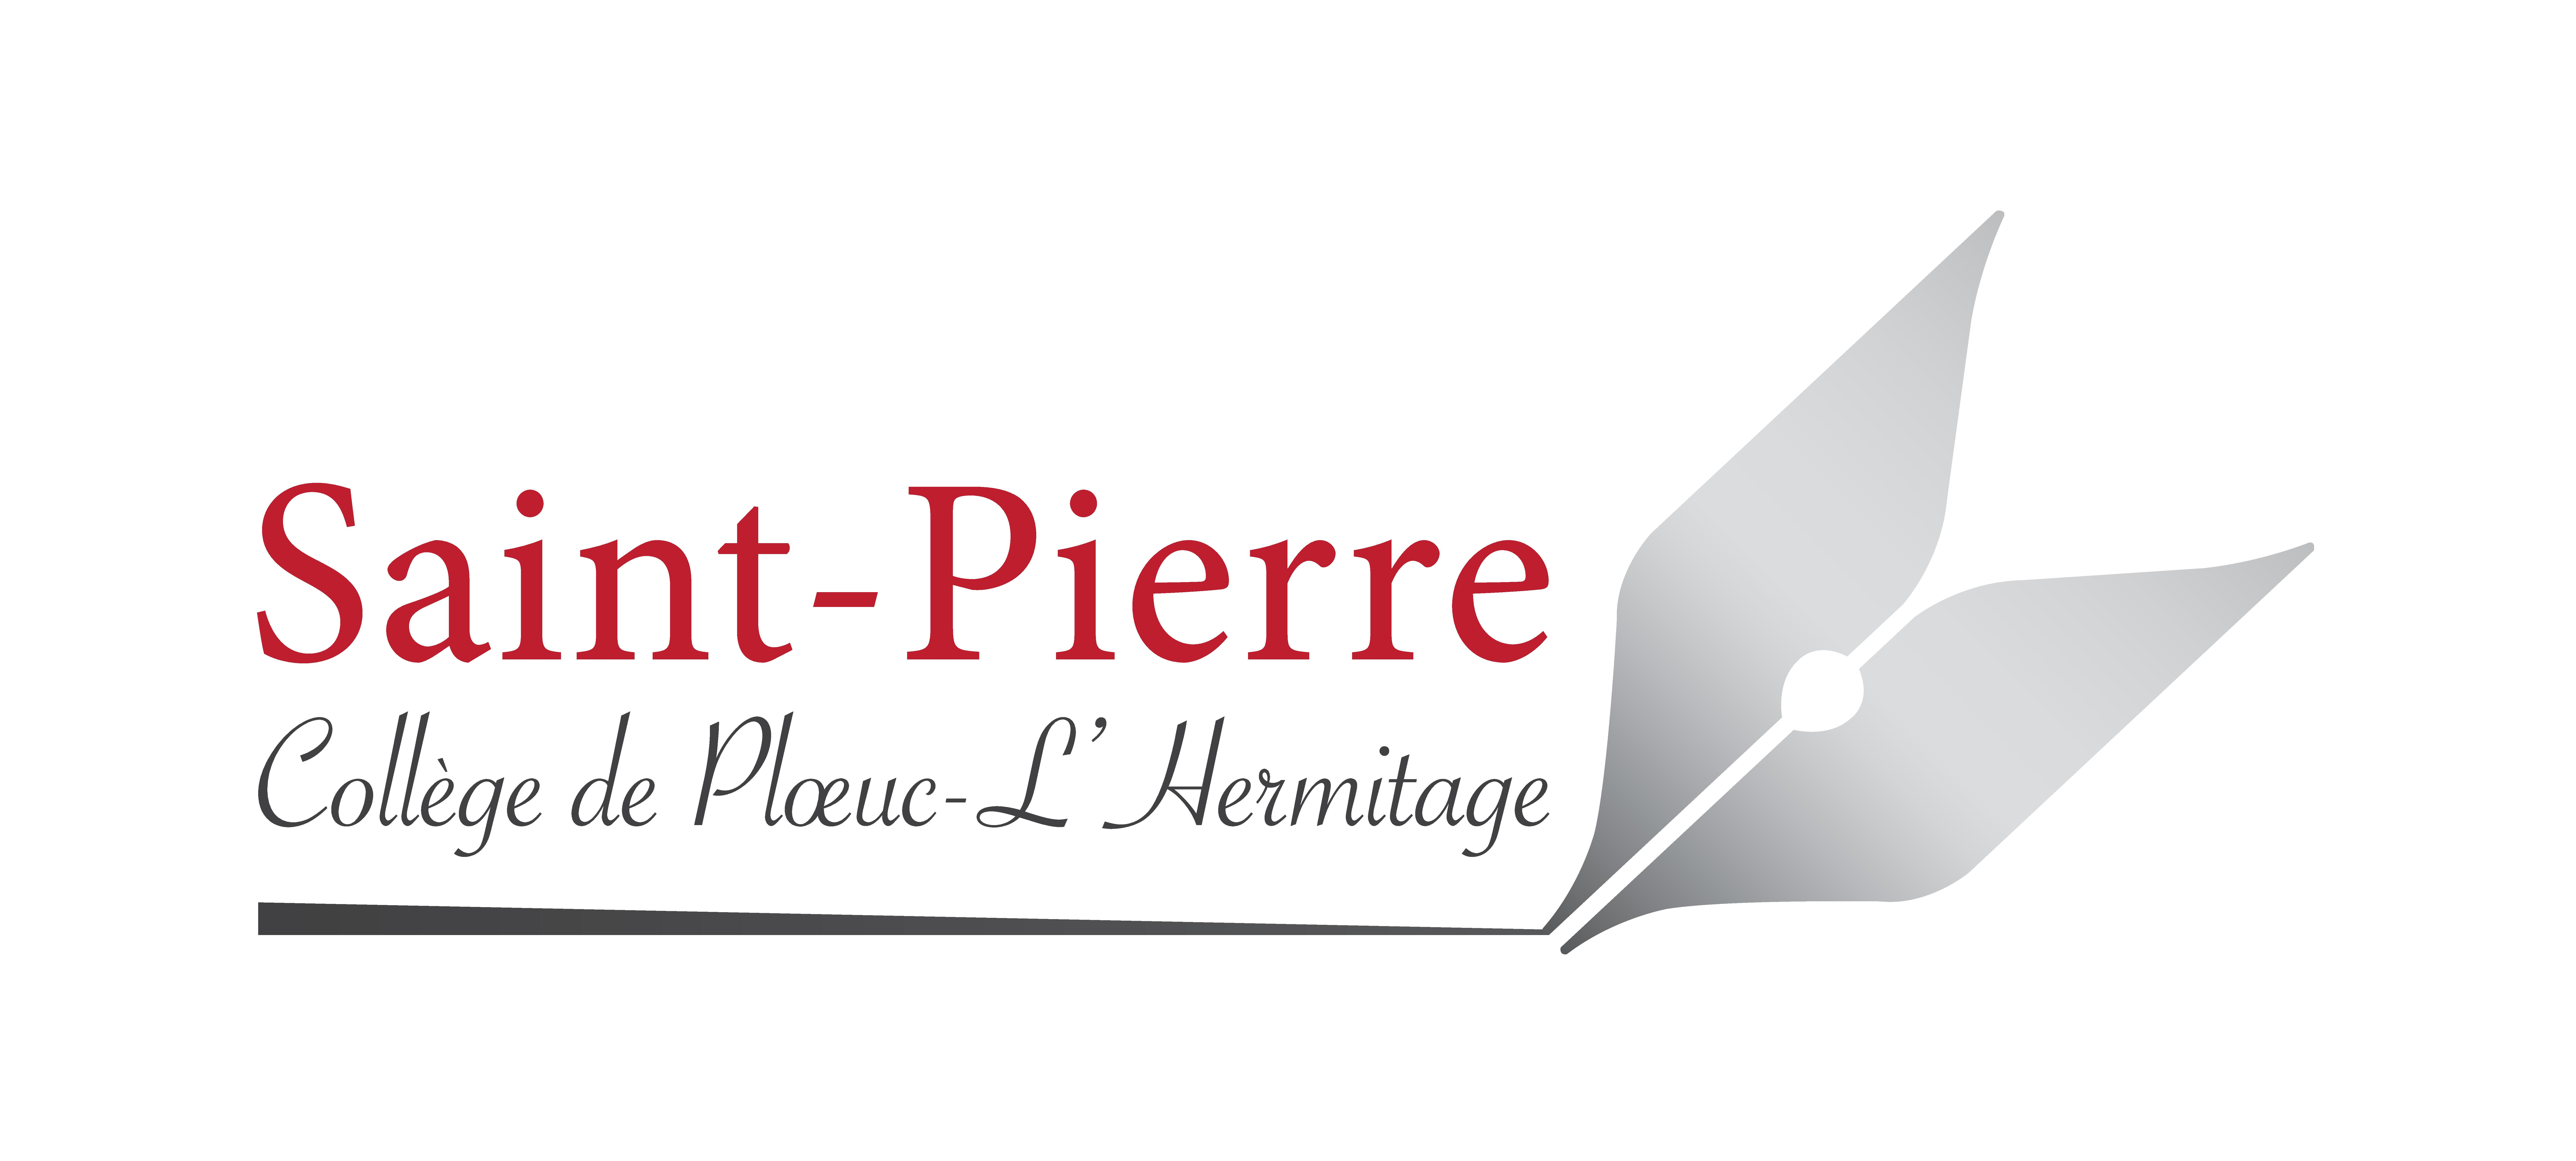 Saint-Pierre, Ploeuc